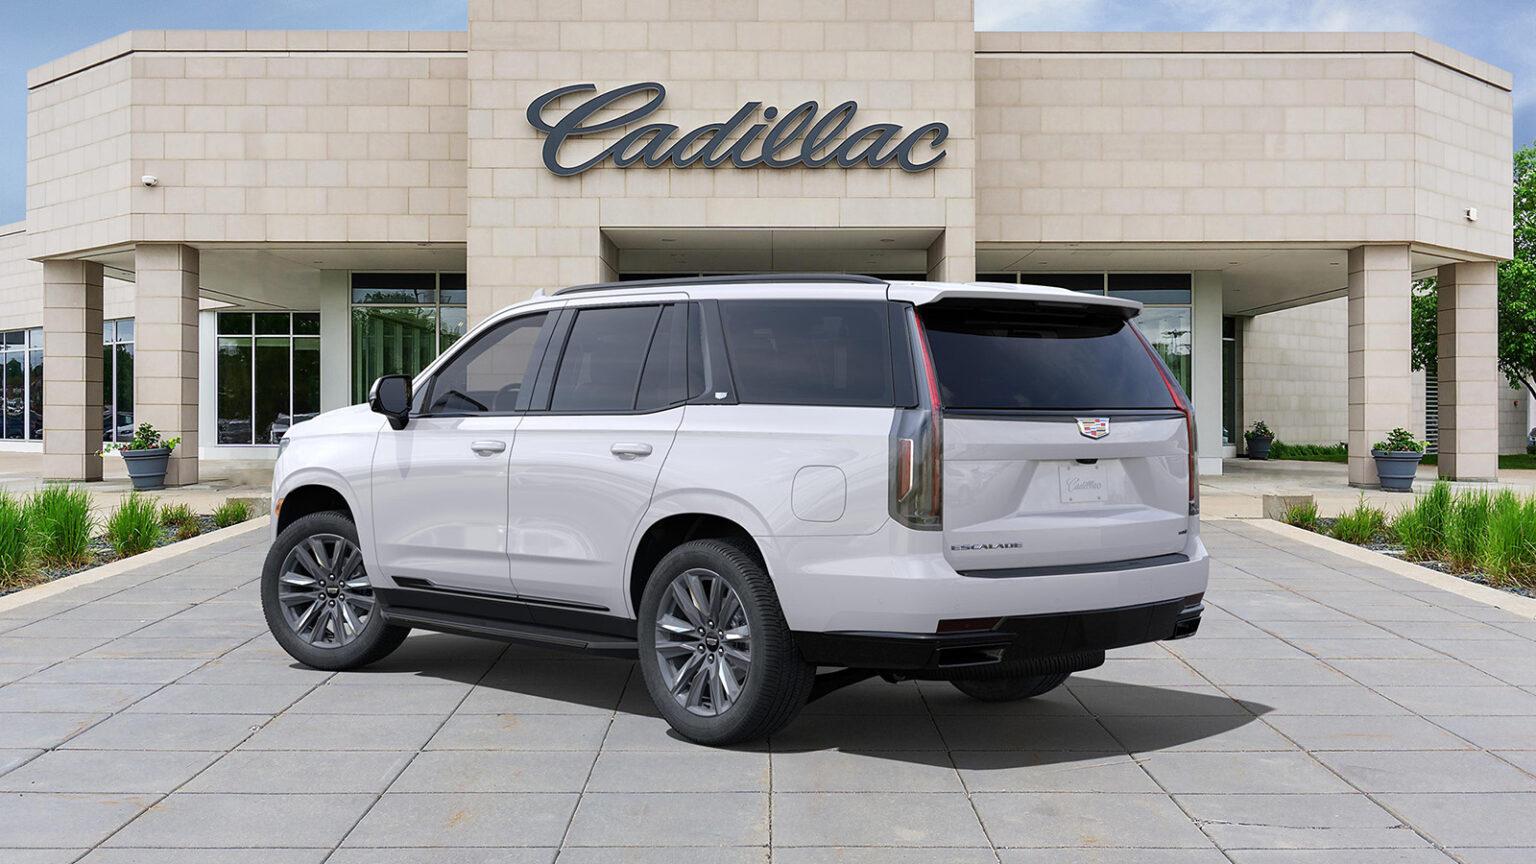 Willis_Cadillac_1GYS4EKL3MR191457_21_ESCALADE_EXT_A003_1600